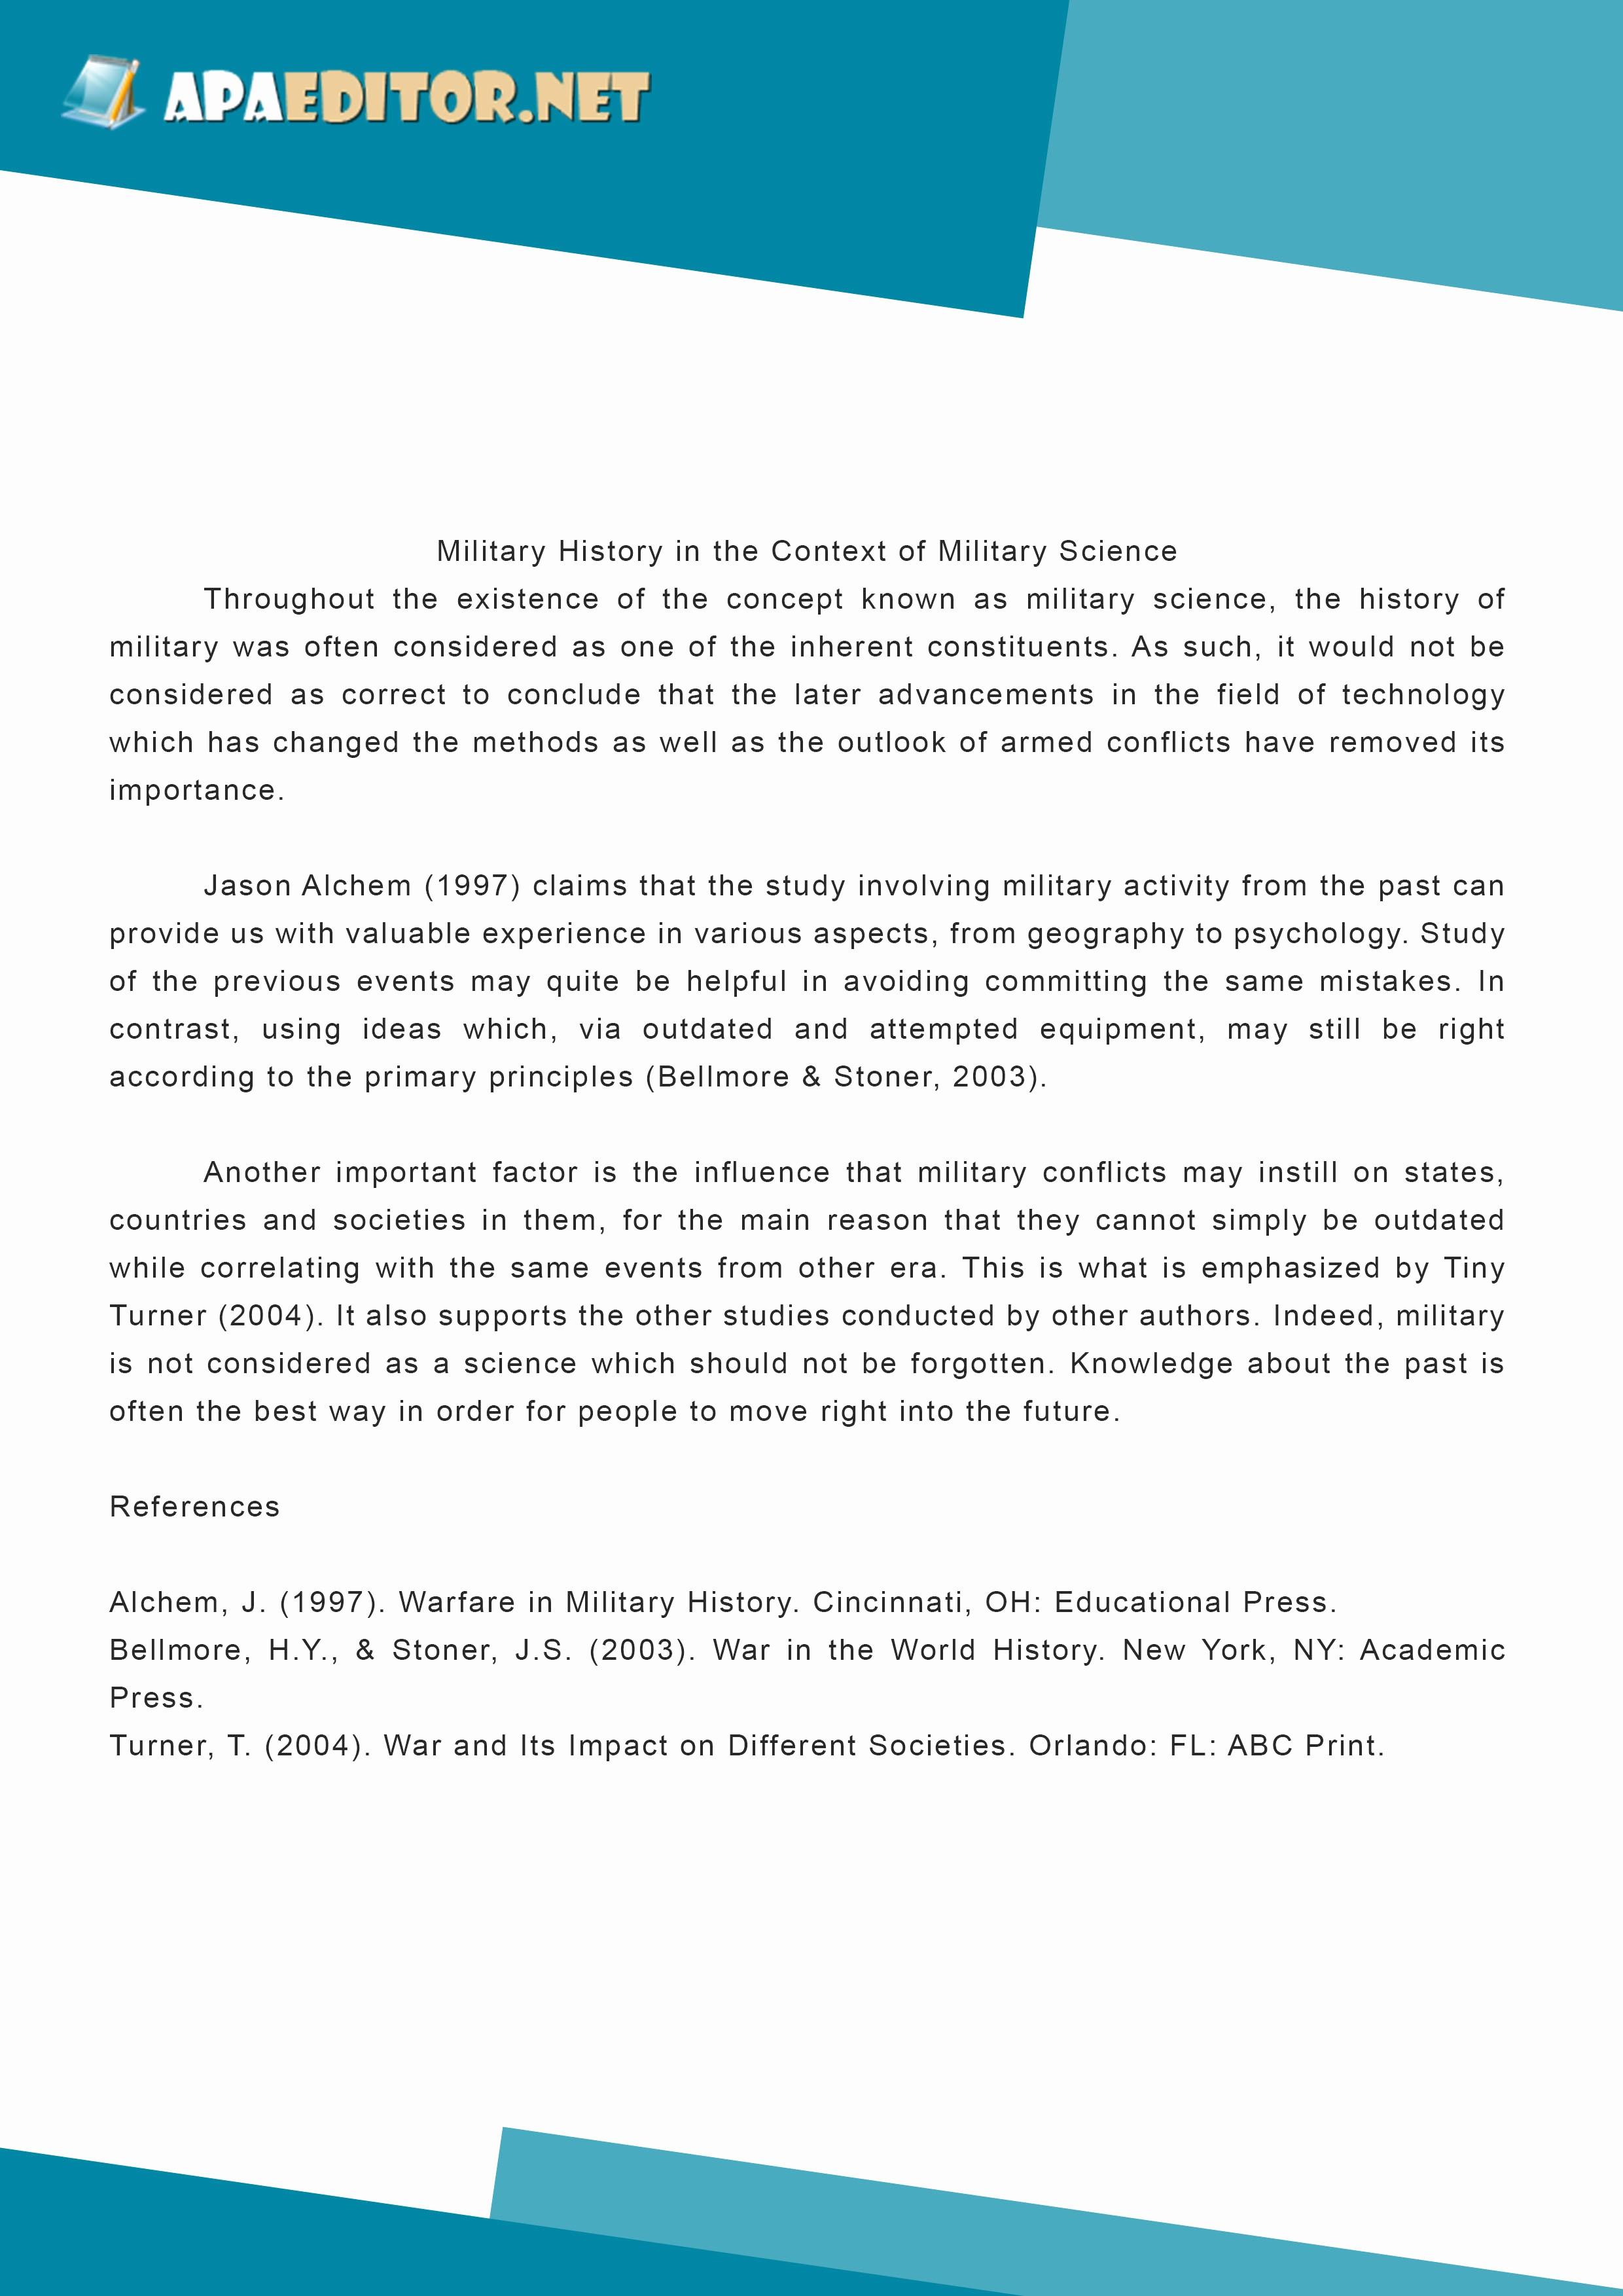 500 Word Essay Mla format Elegant How Many Pages is 1500 Words In Mla format Hunt Hankk